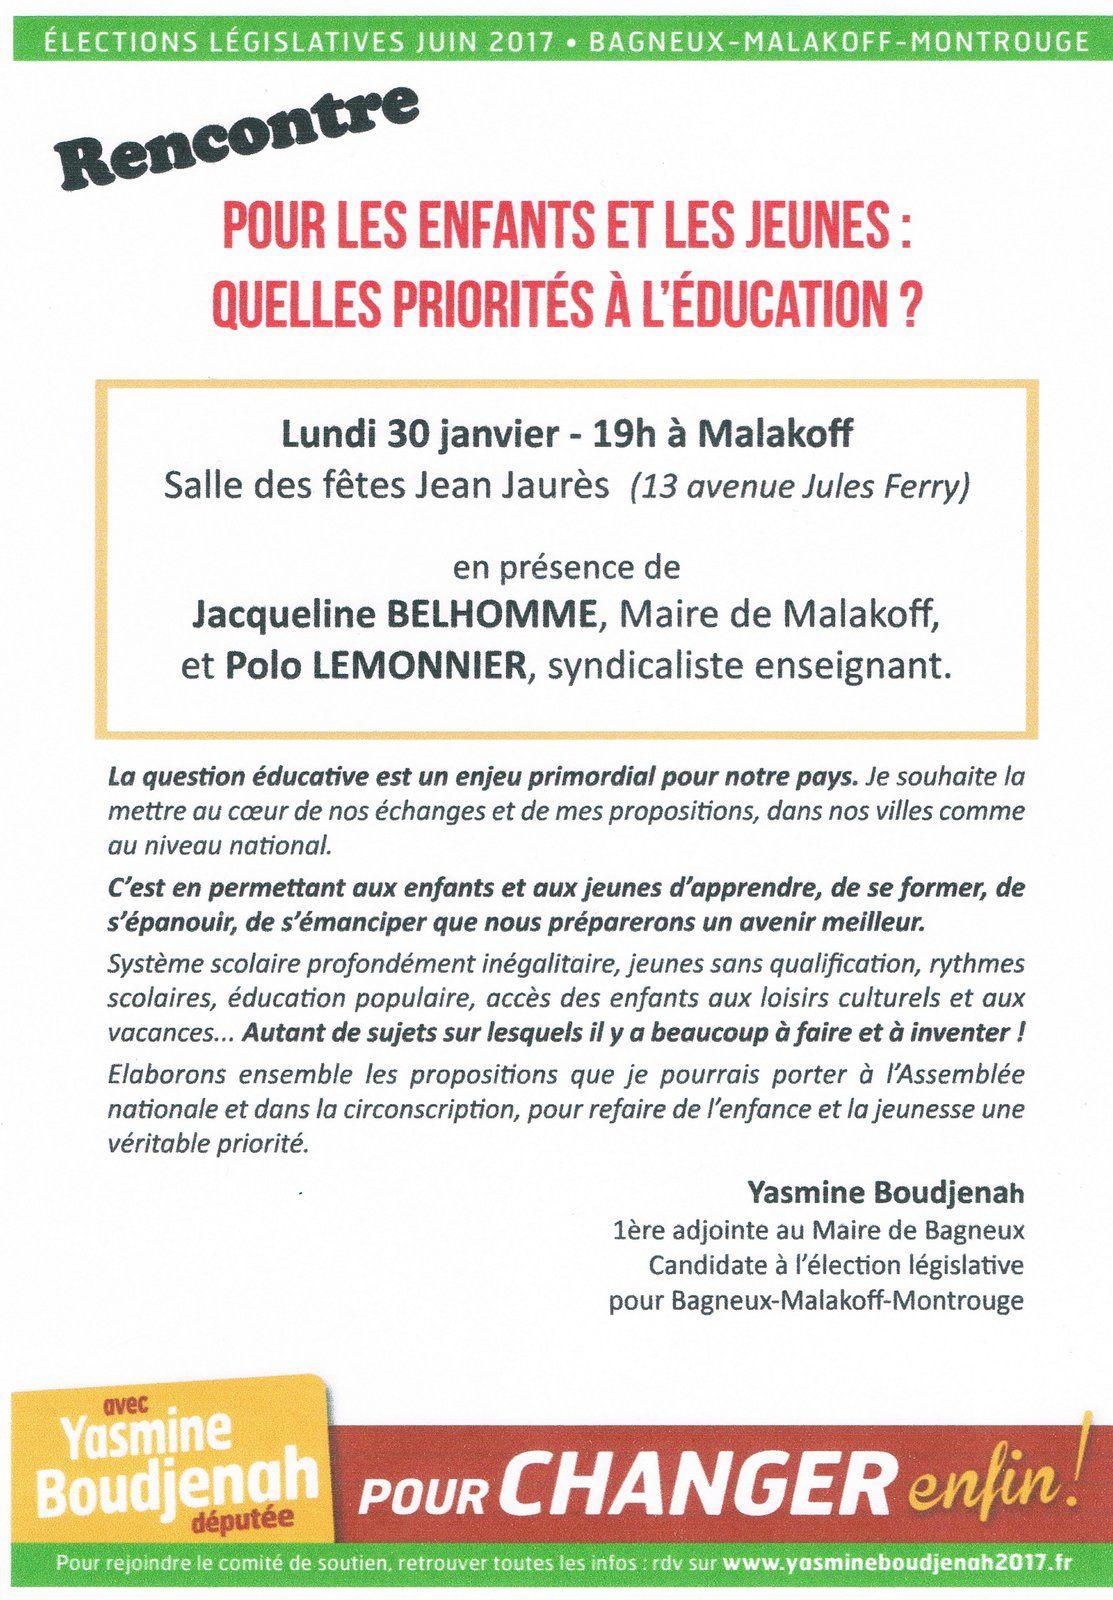 Malakoff: avec Yasmine Boudjenah, pour l'Education